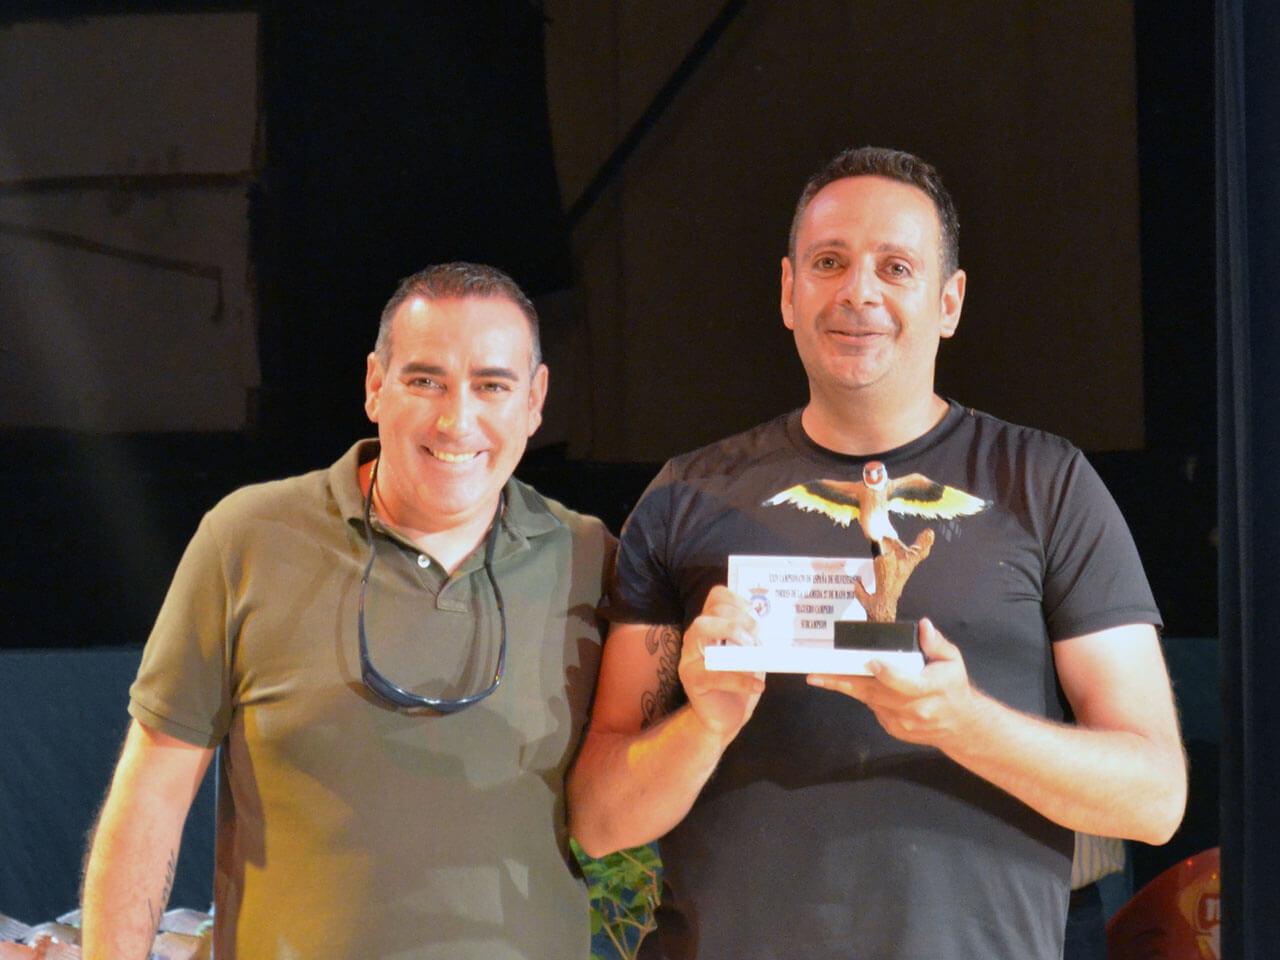 Campeonato España Cante 2018 - César Cebria´n Subcampeon Jilg